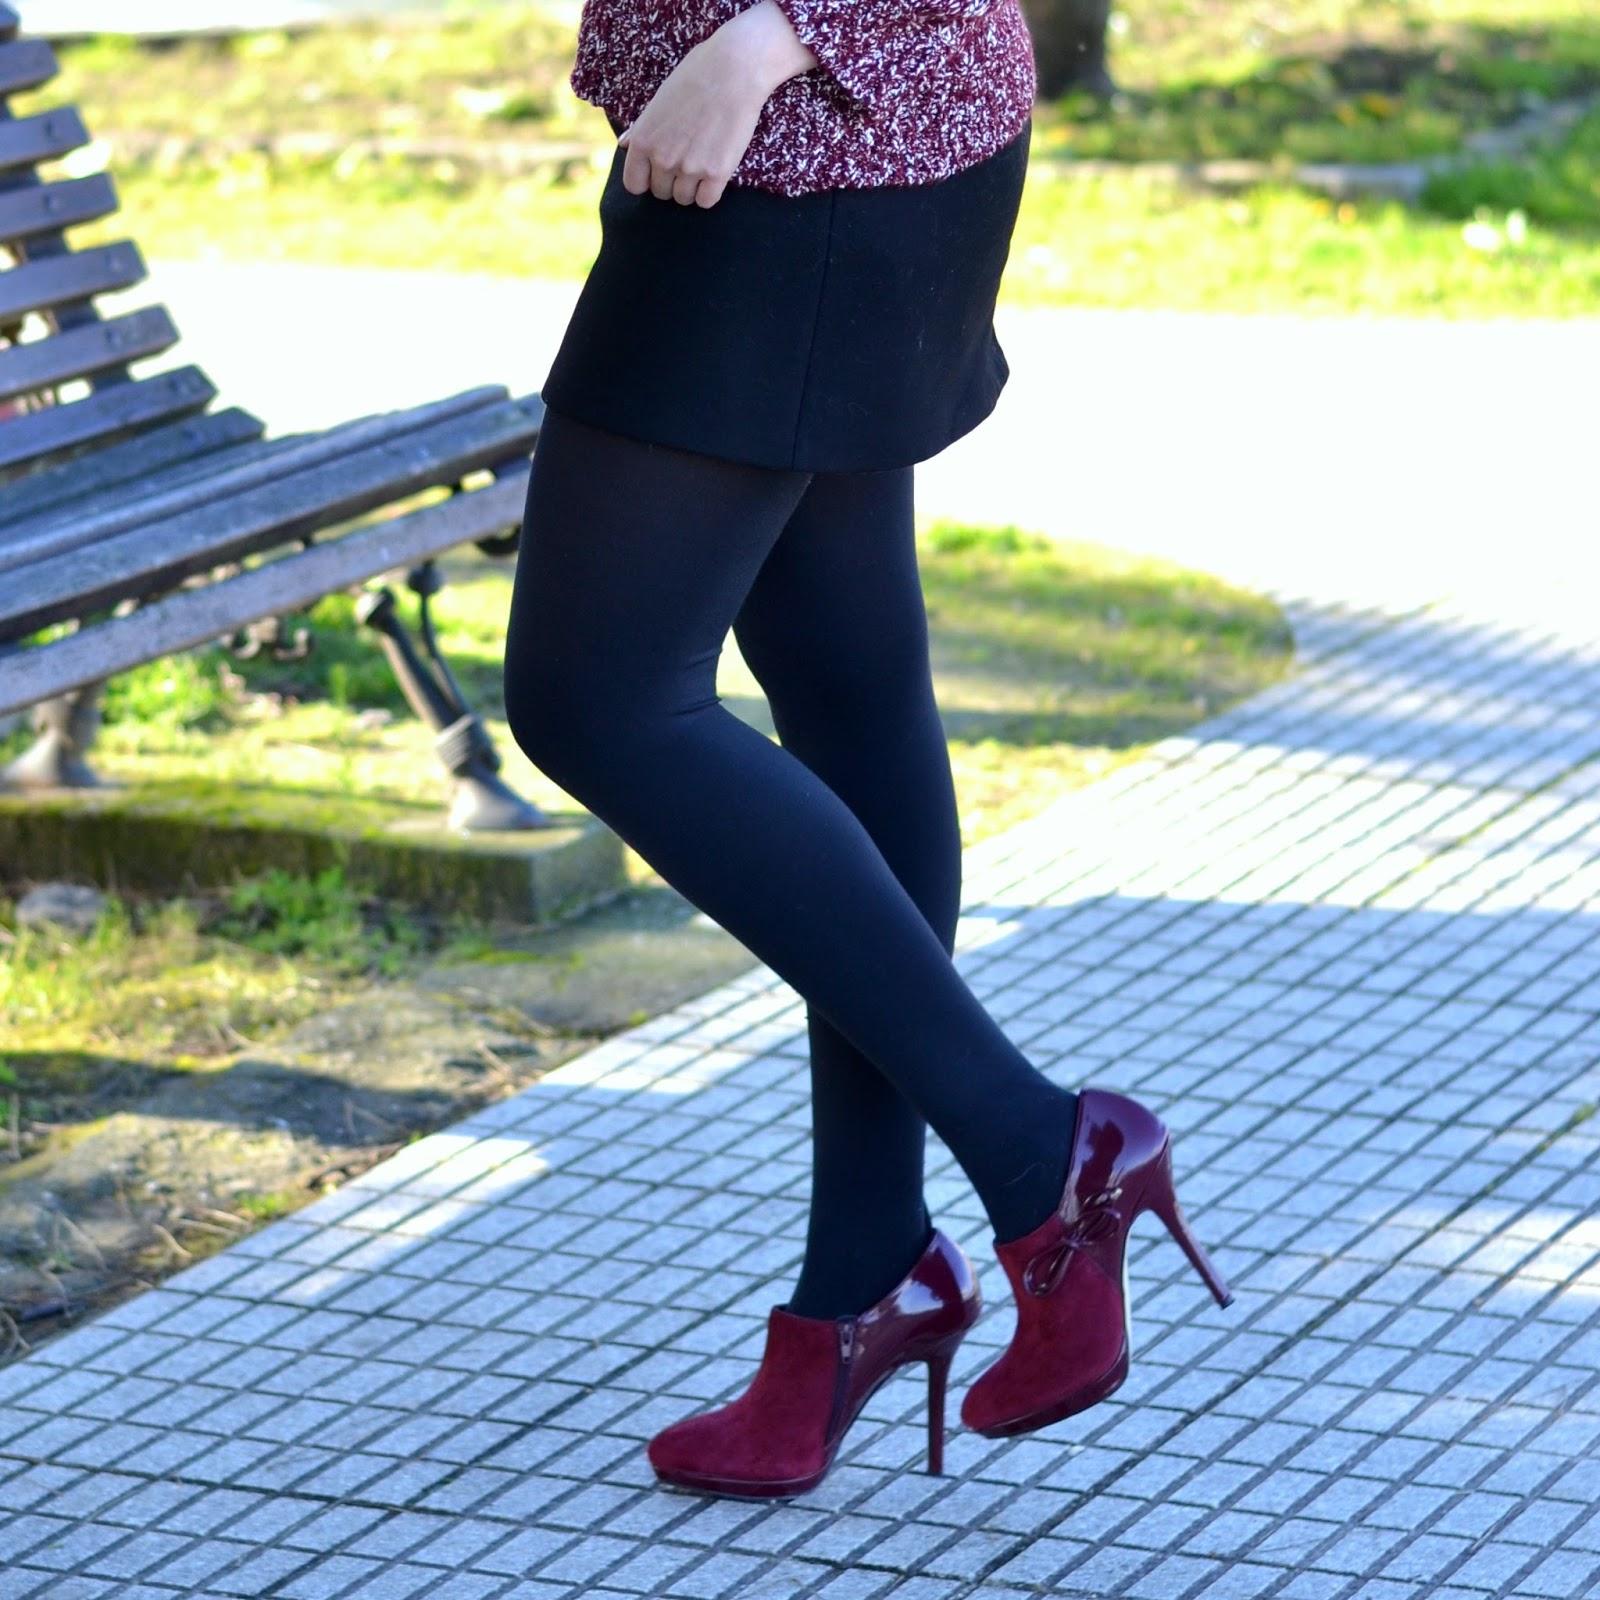 botines menbur tacon burgundy zapatos